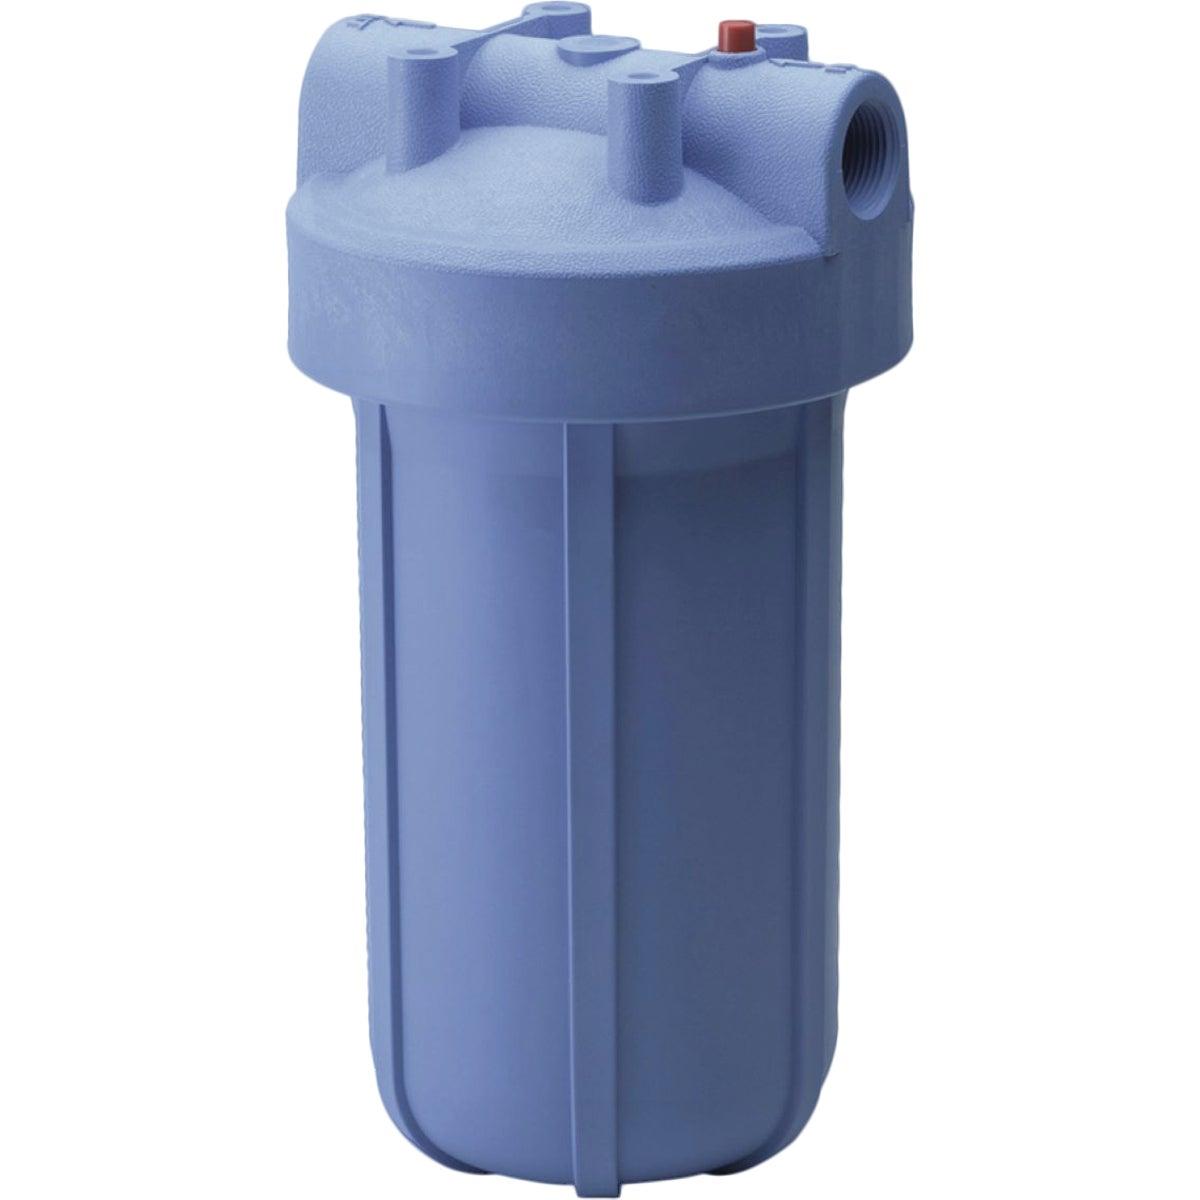 Culligan Heavy-Duty Whole House Sediment Water Filter, HD950A